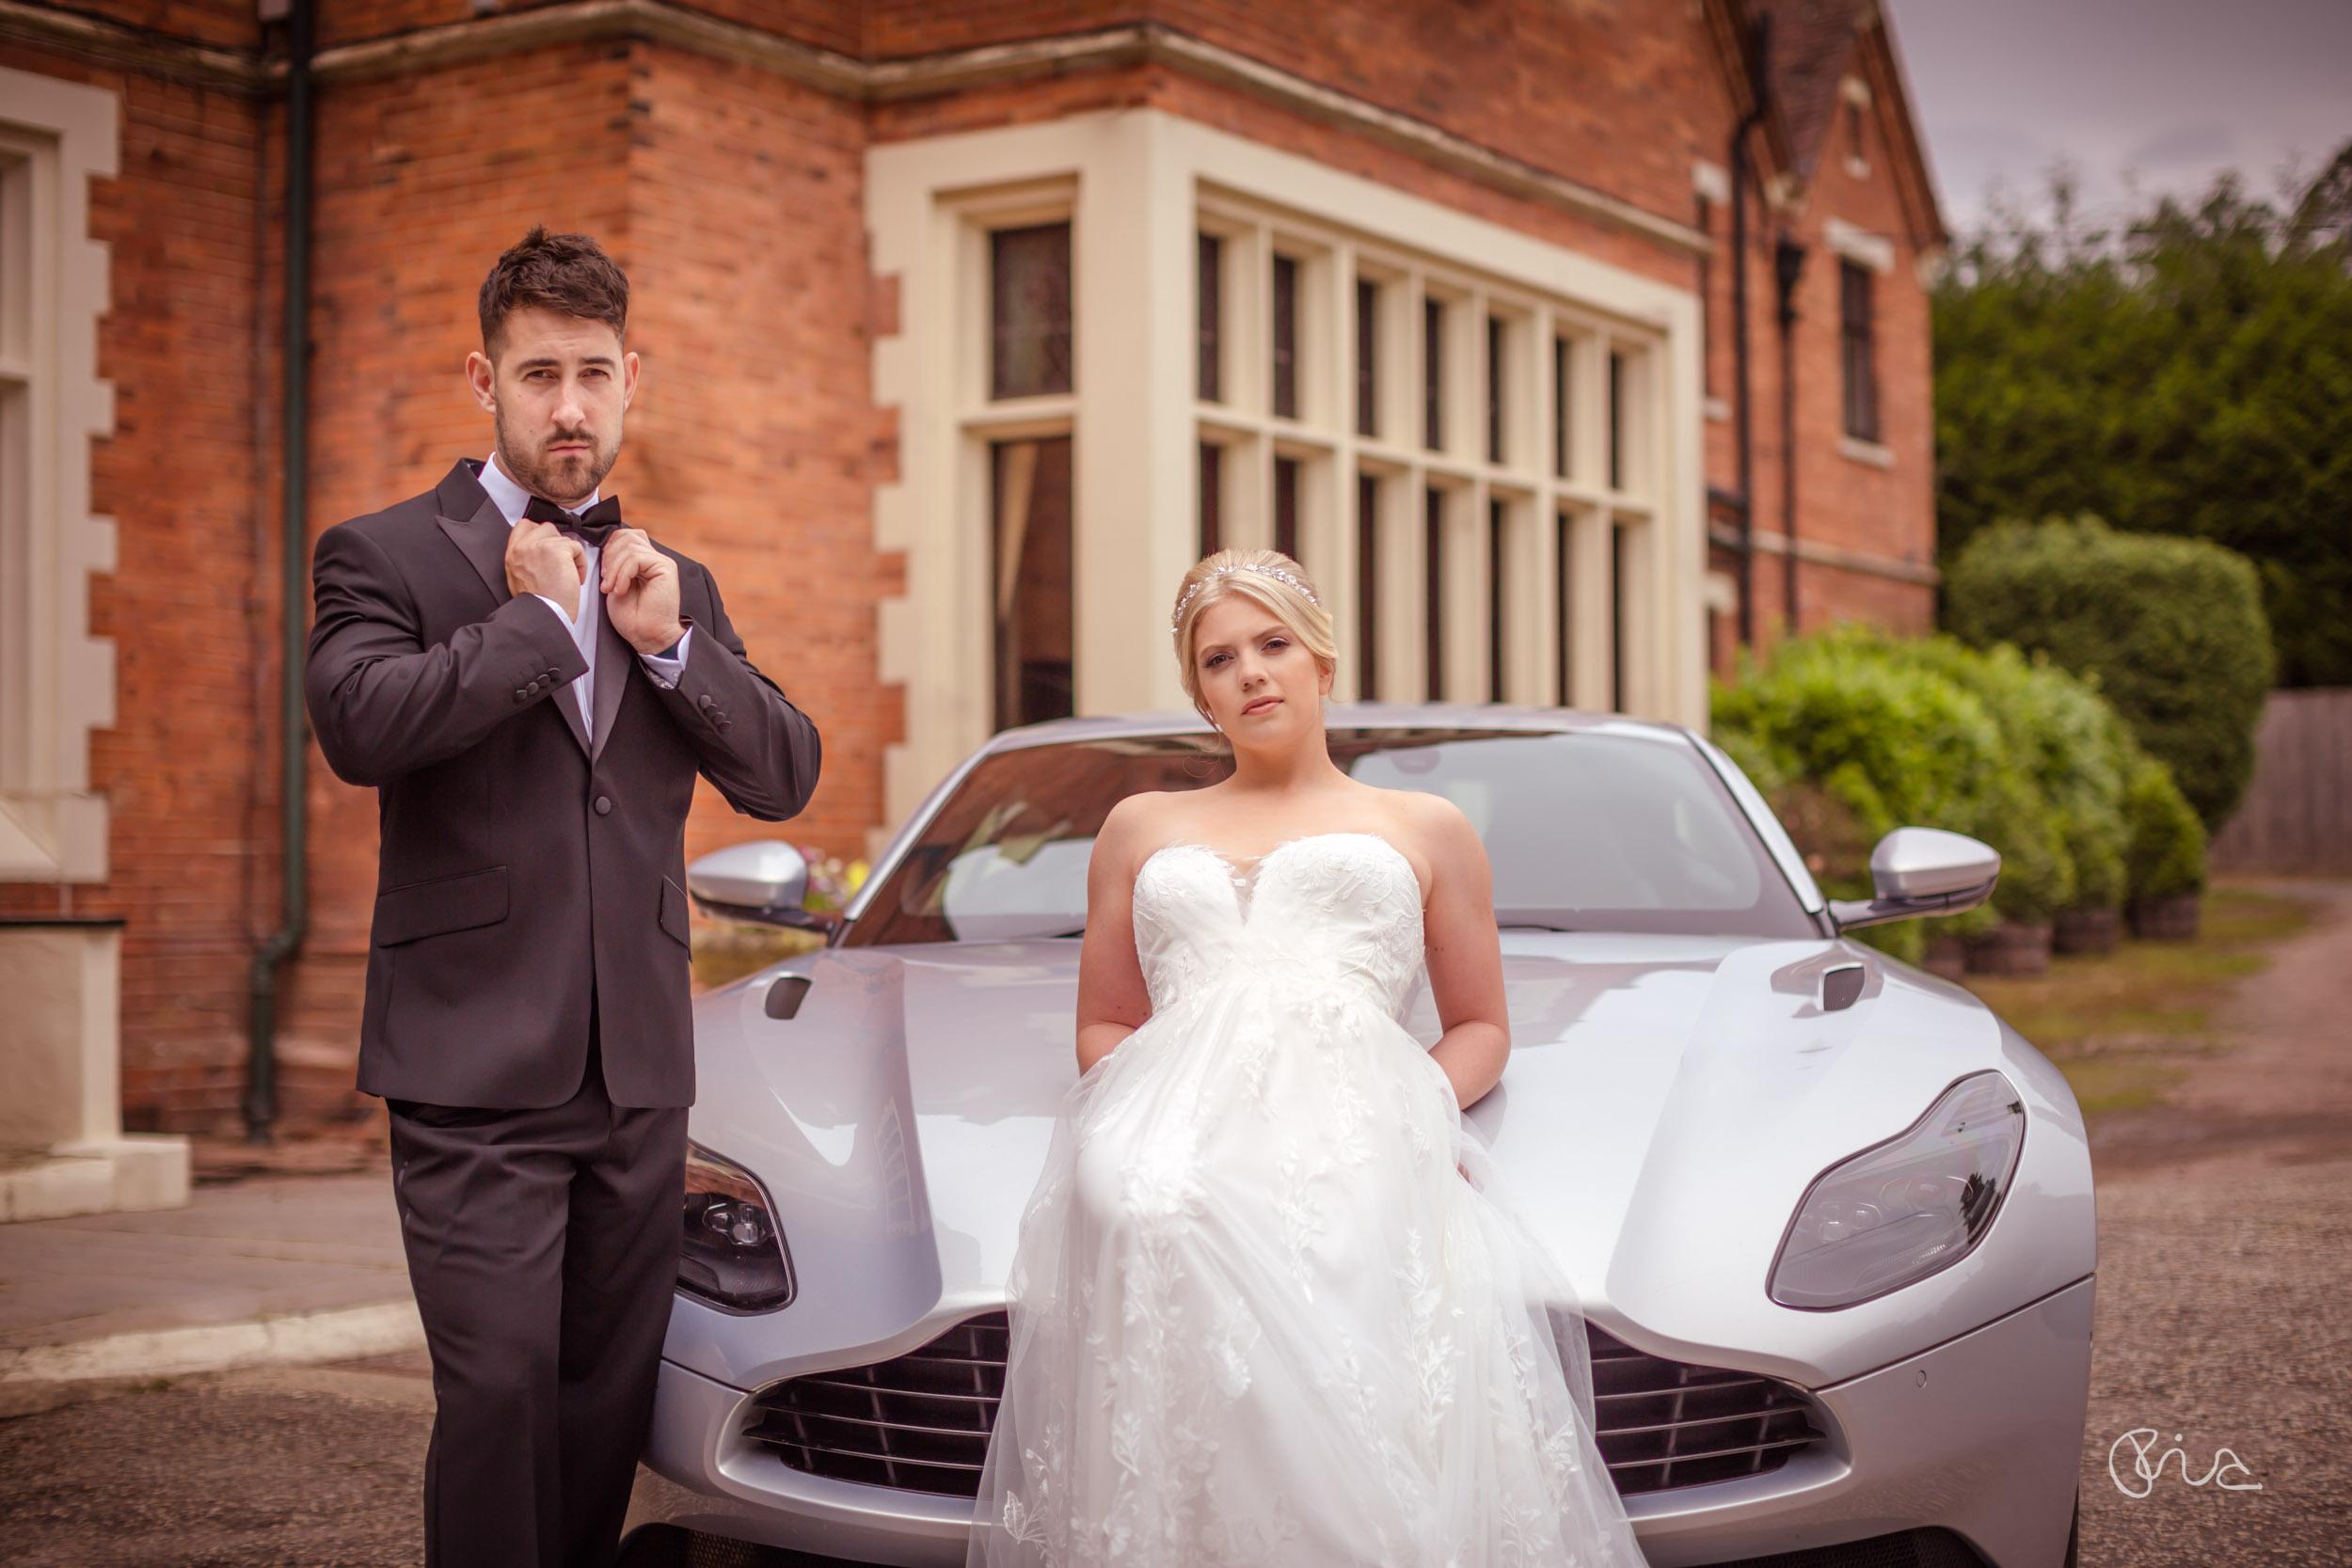 Highley Manor weddings